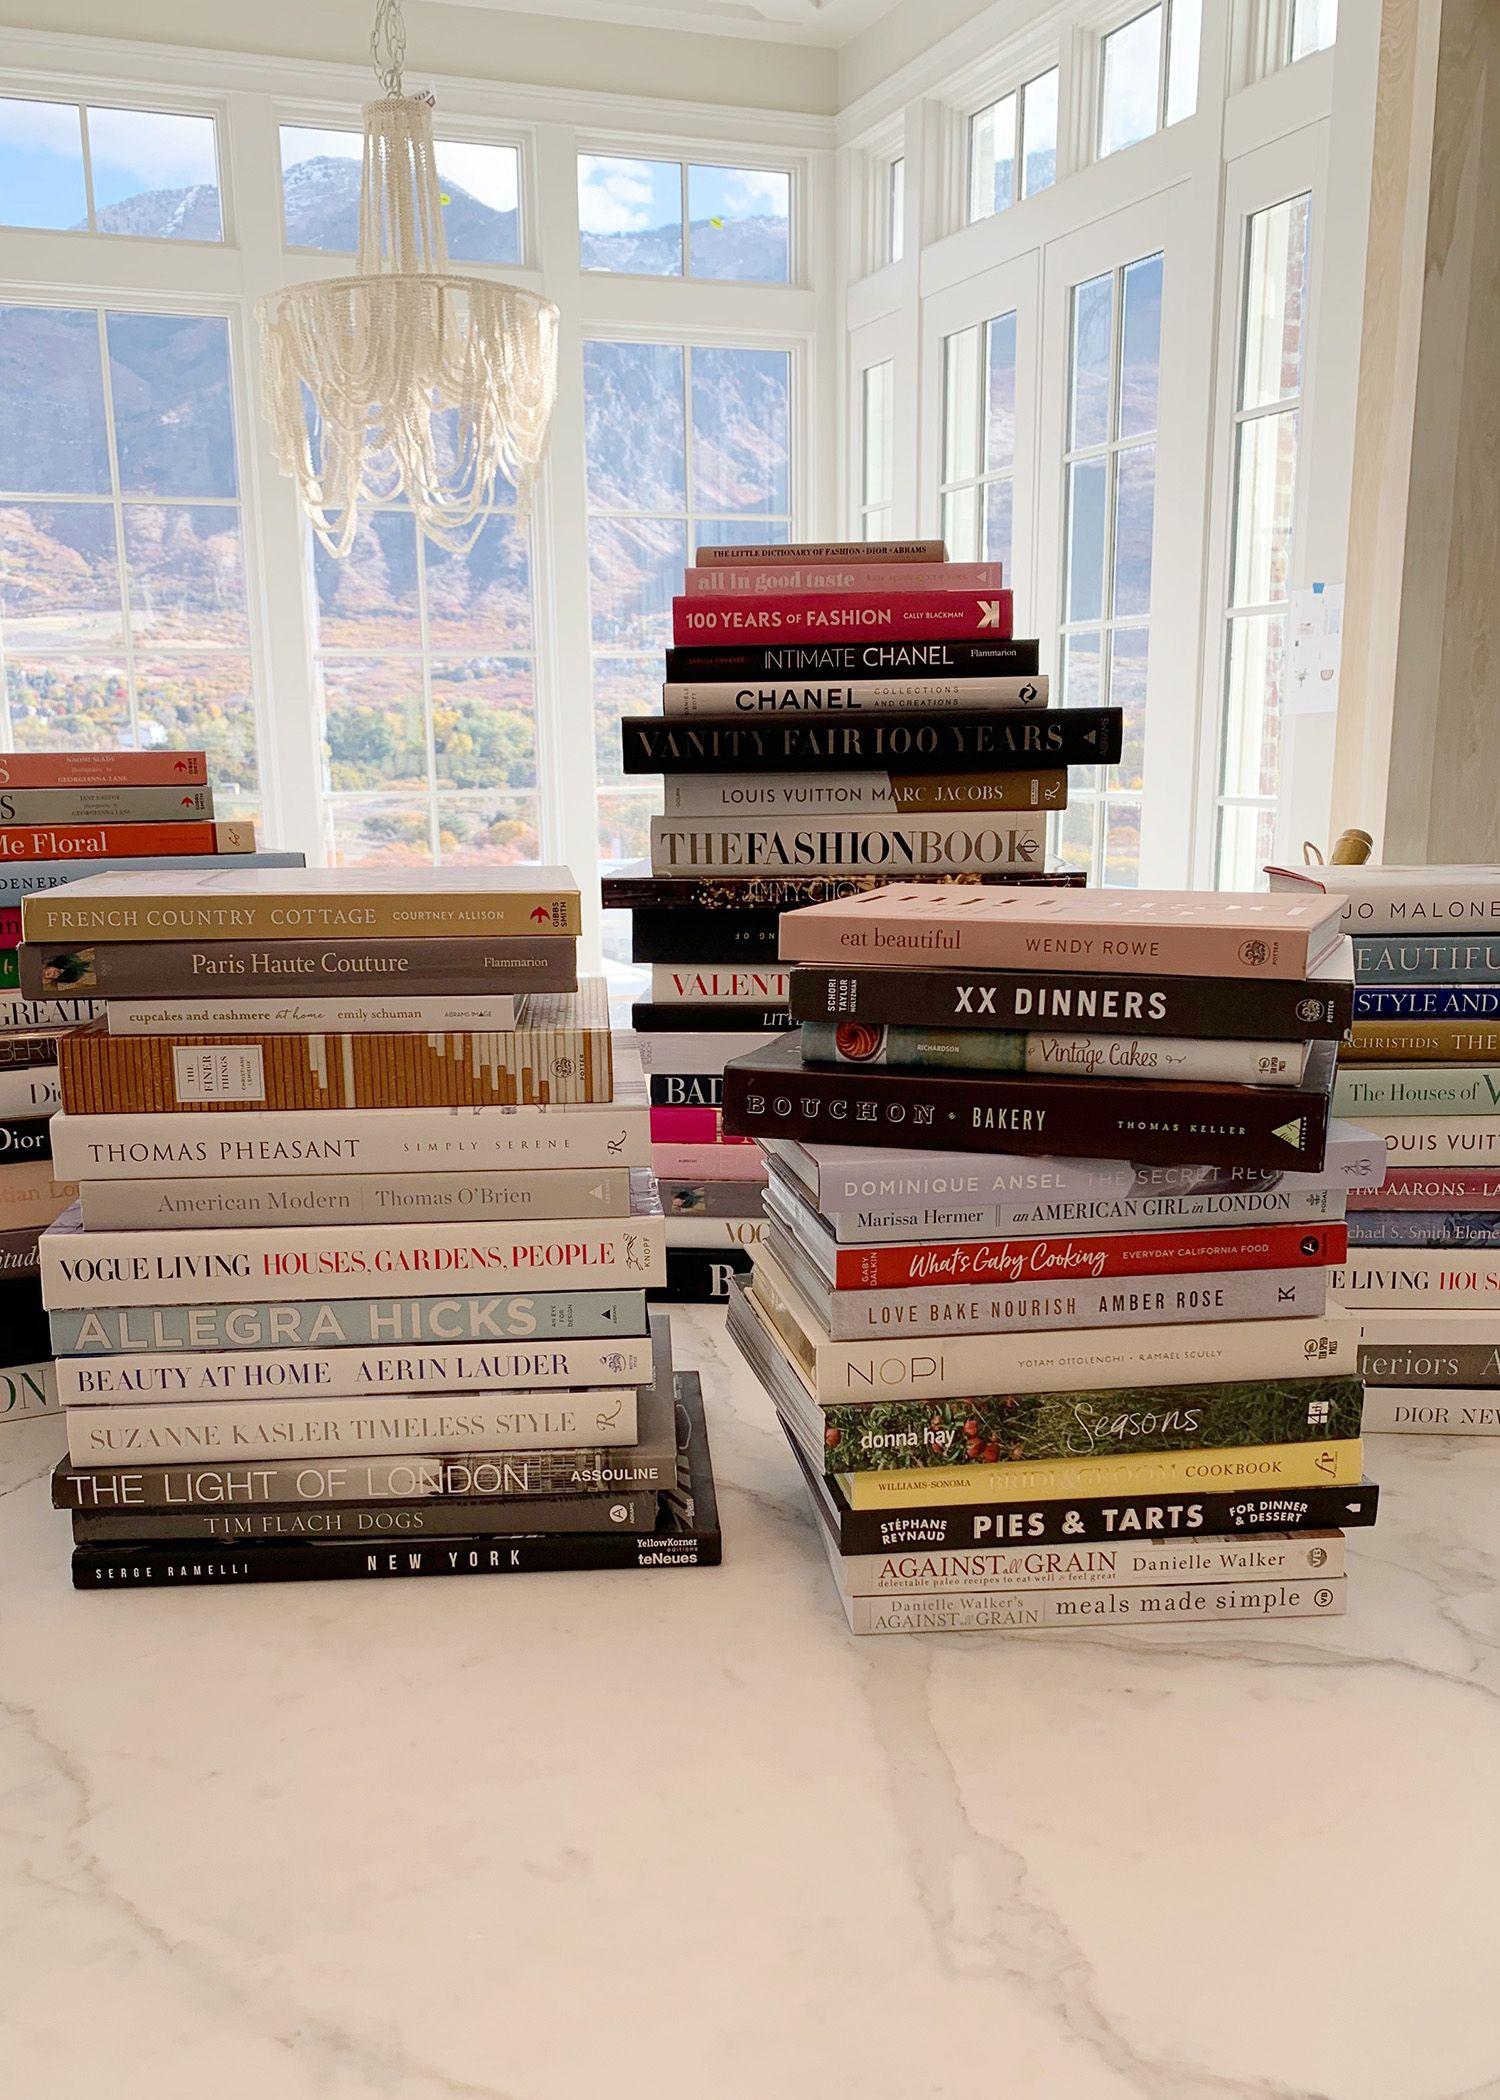 11 Coffee Table Books Every Home Needs Coffee Table Books Coffee Table Books Decor Book Decor